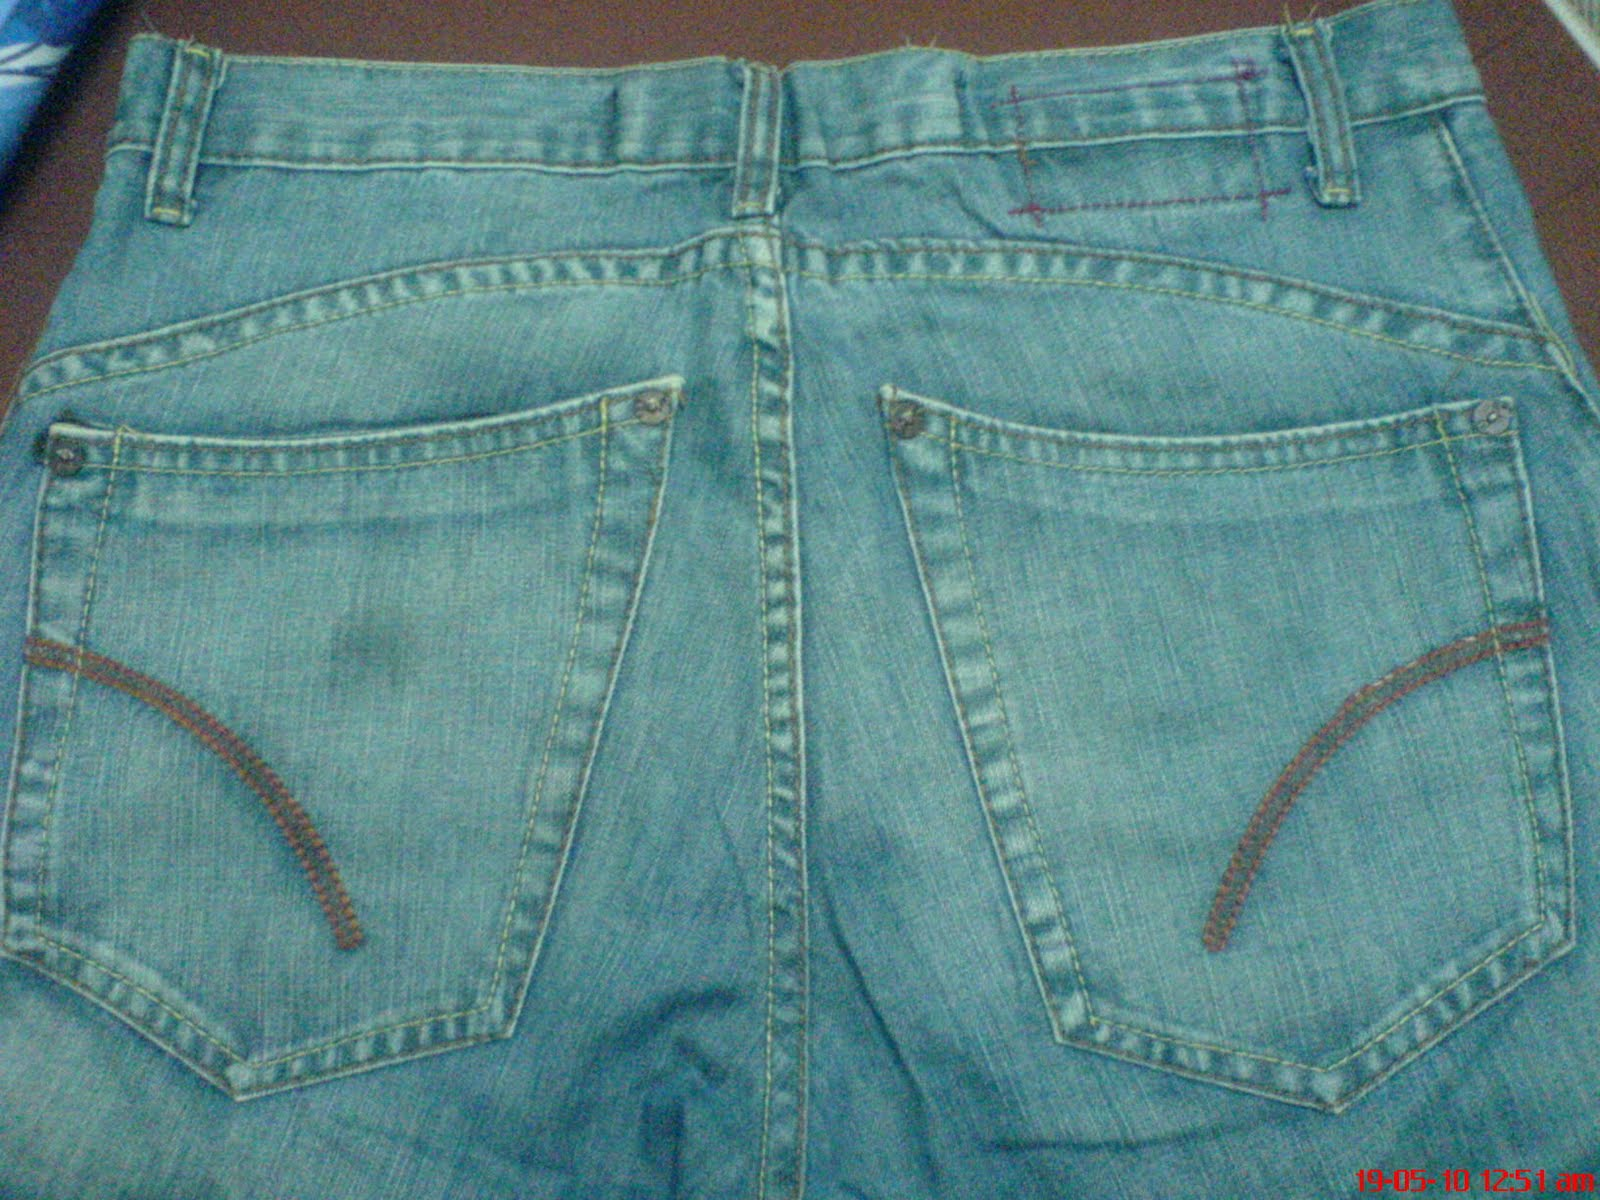 Planet Vintage Jeans Zara Sold Andrew Smith Regular Fit Biru 31 Kaler Lusuh Design Mcm Levis Engineer Original Bundle Waist 32 Condition 9 10 Price